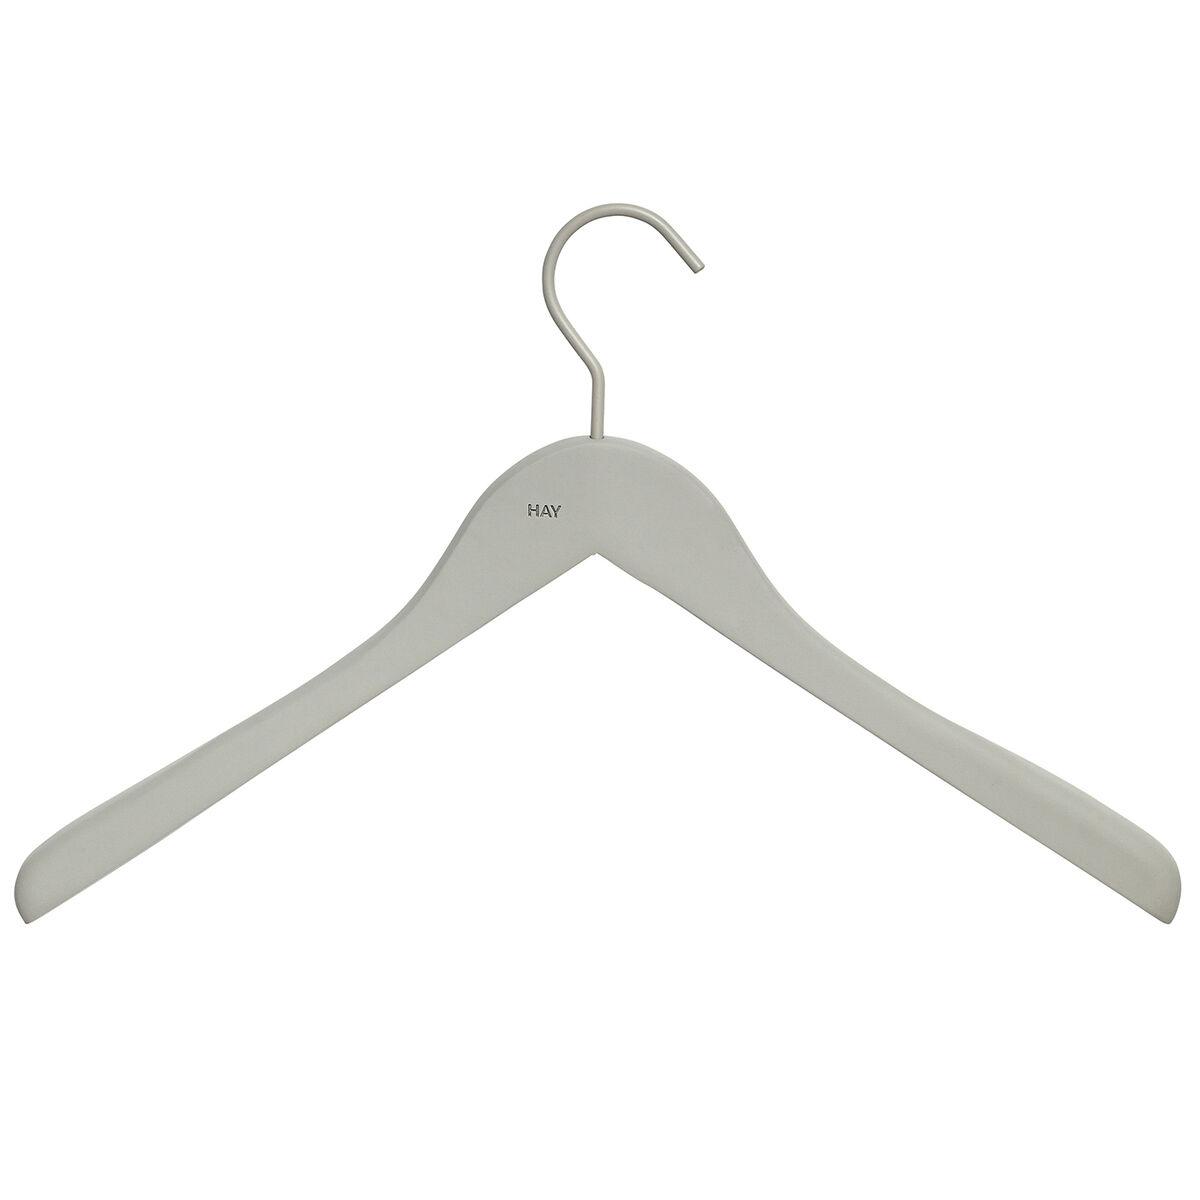 Hay Soft vaateripustin leve�, harmaa, 4 kpl